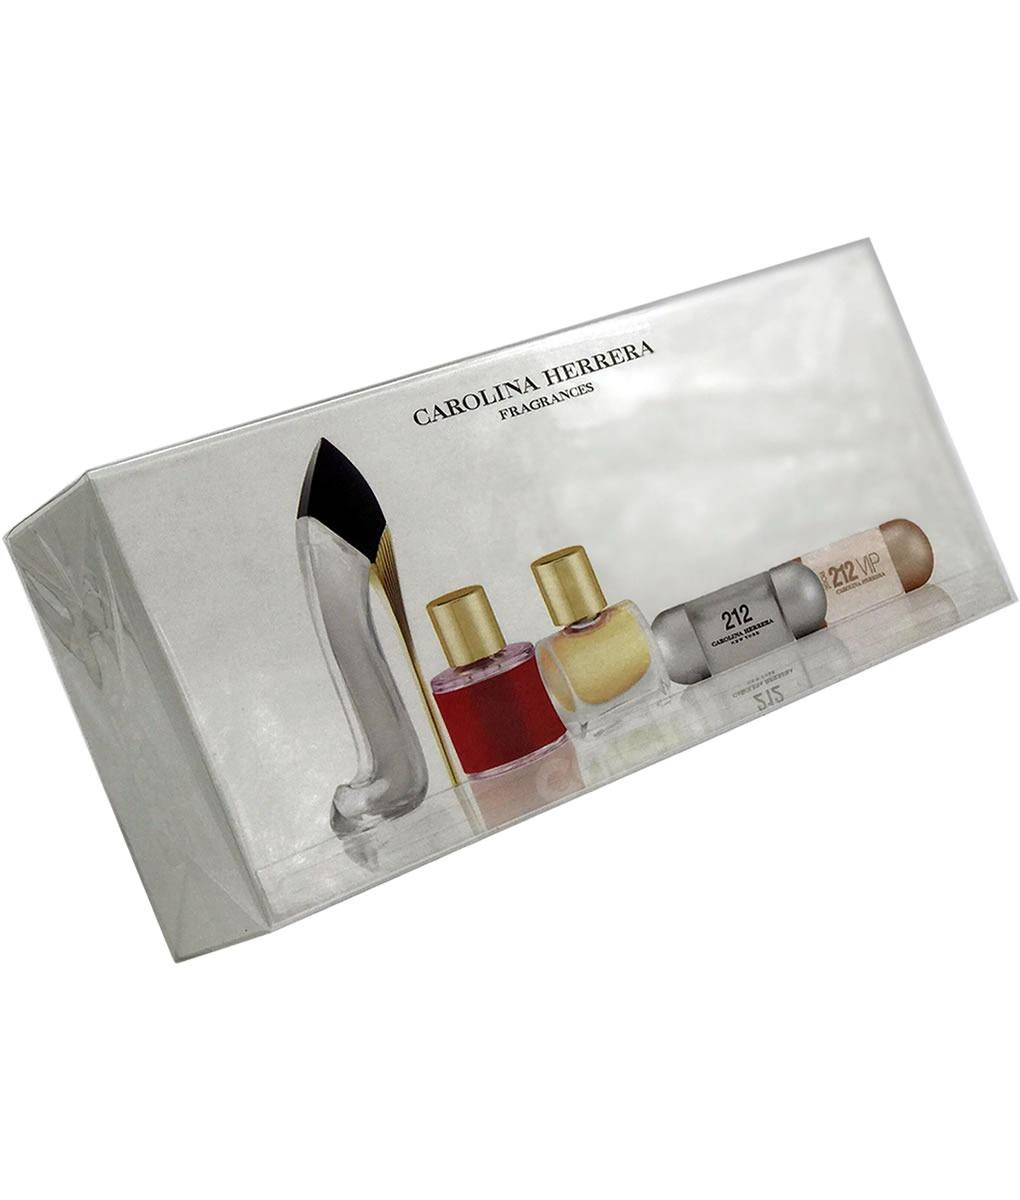 048d116f35559 minitallas de perfume carolina herrera x 5 para mujer. Cargando zoom.